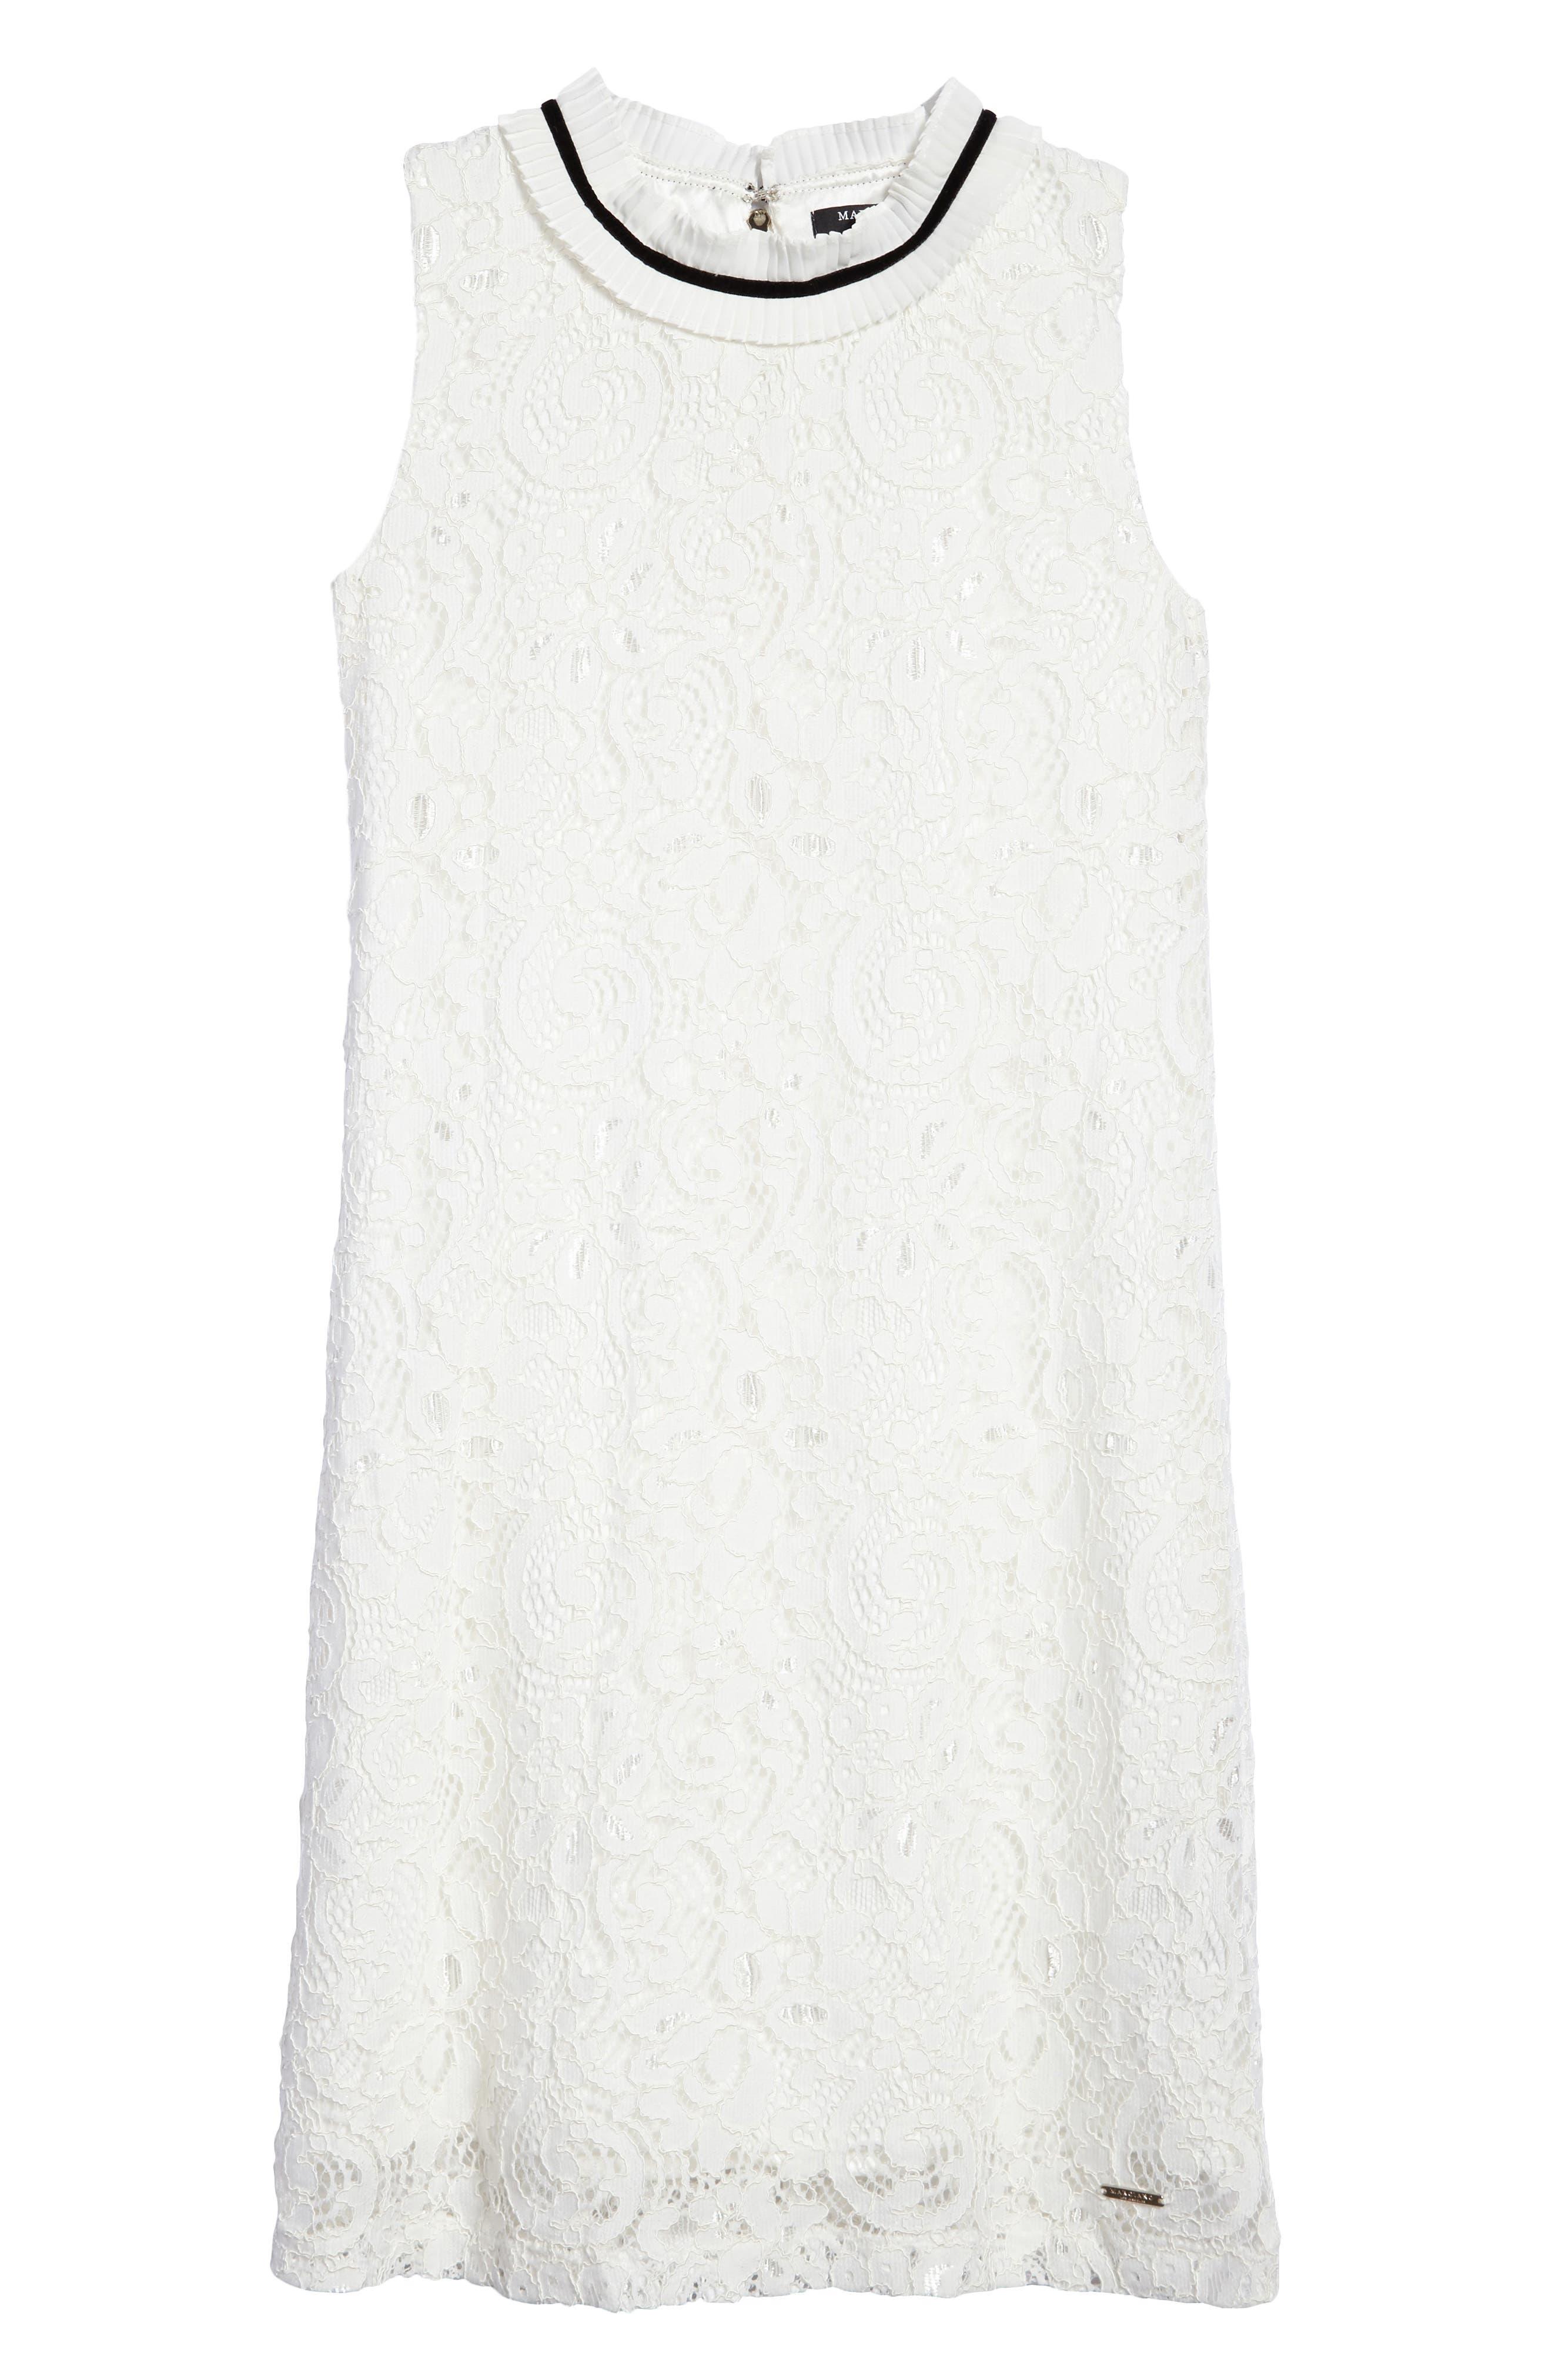 Main Image - Marciano Sleeveless Lace Dress (Big Girls)